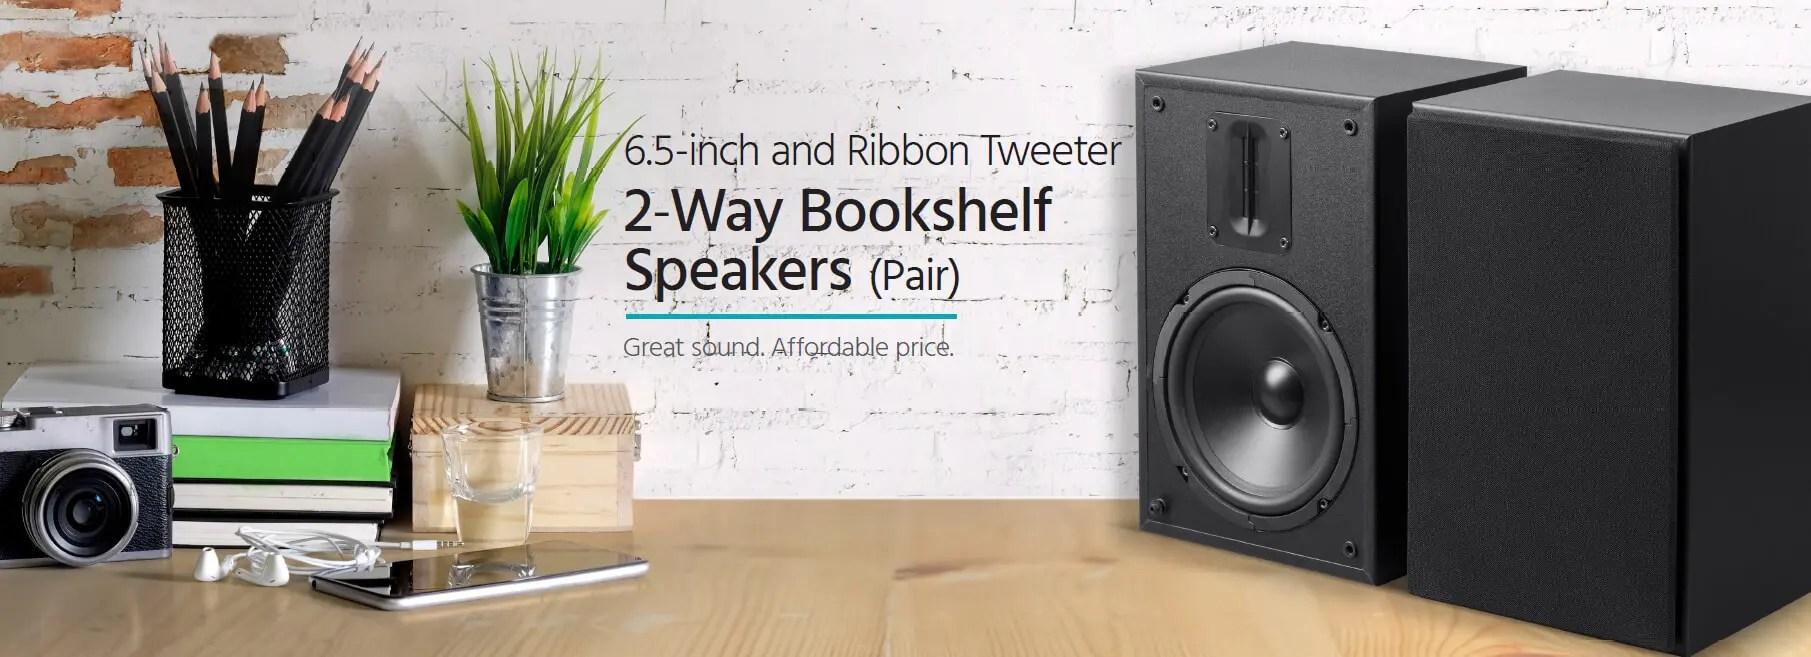 mp-65rt 6.5in and ribbon tweeter 2-way bookshelf speakers (pair